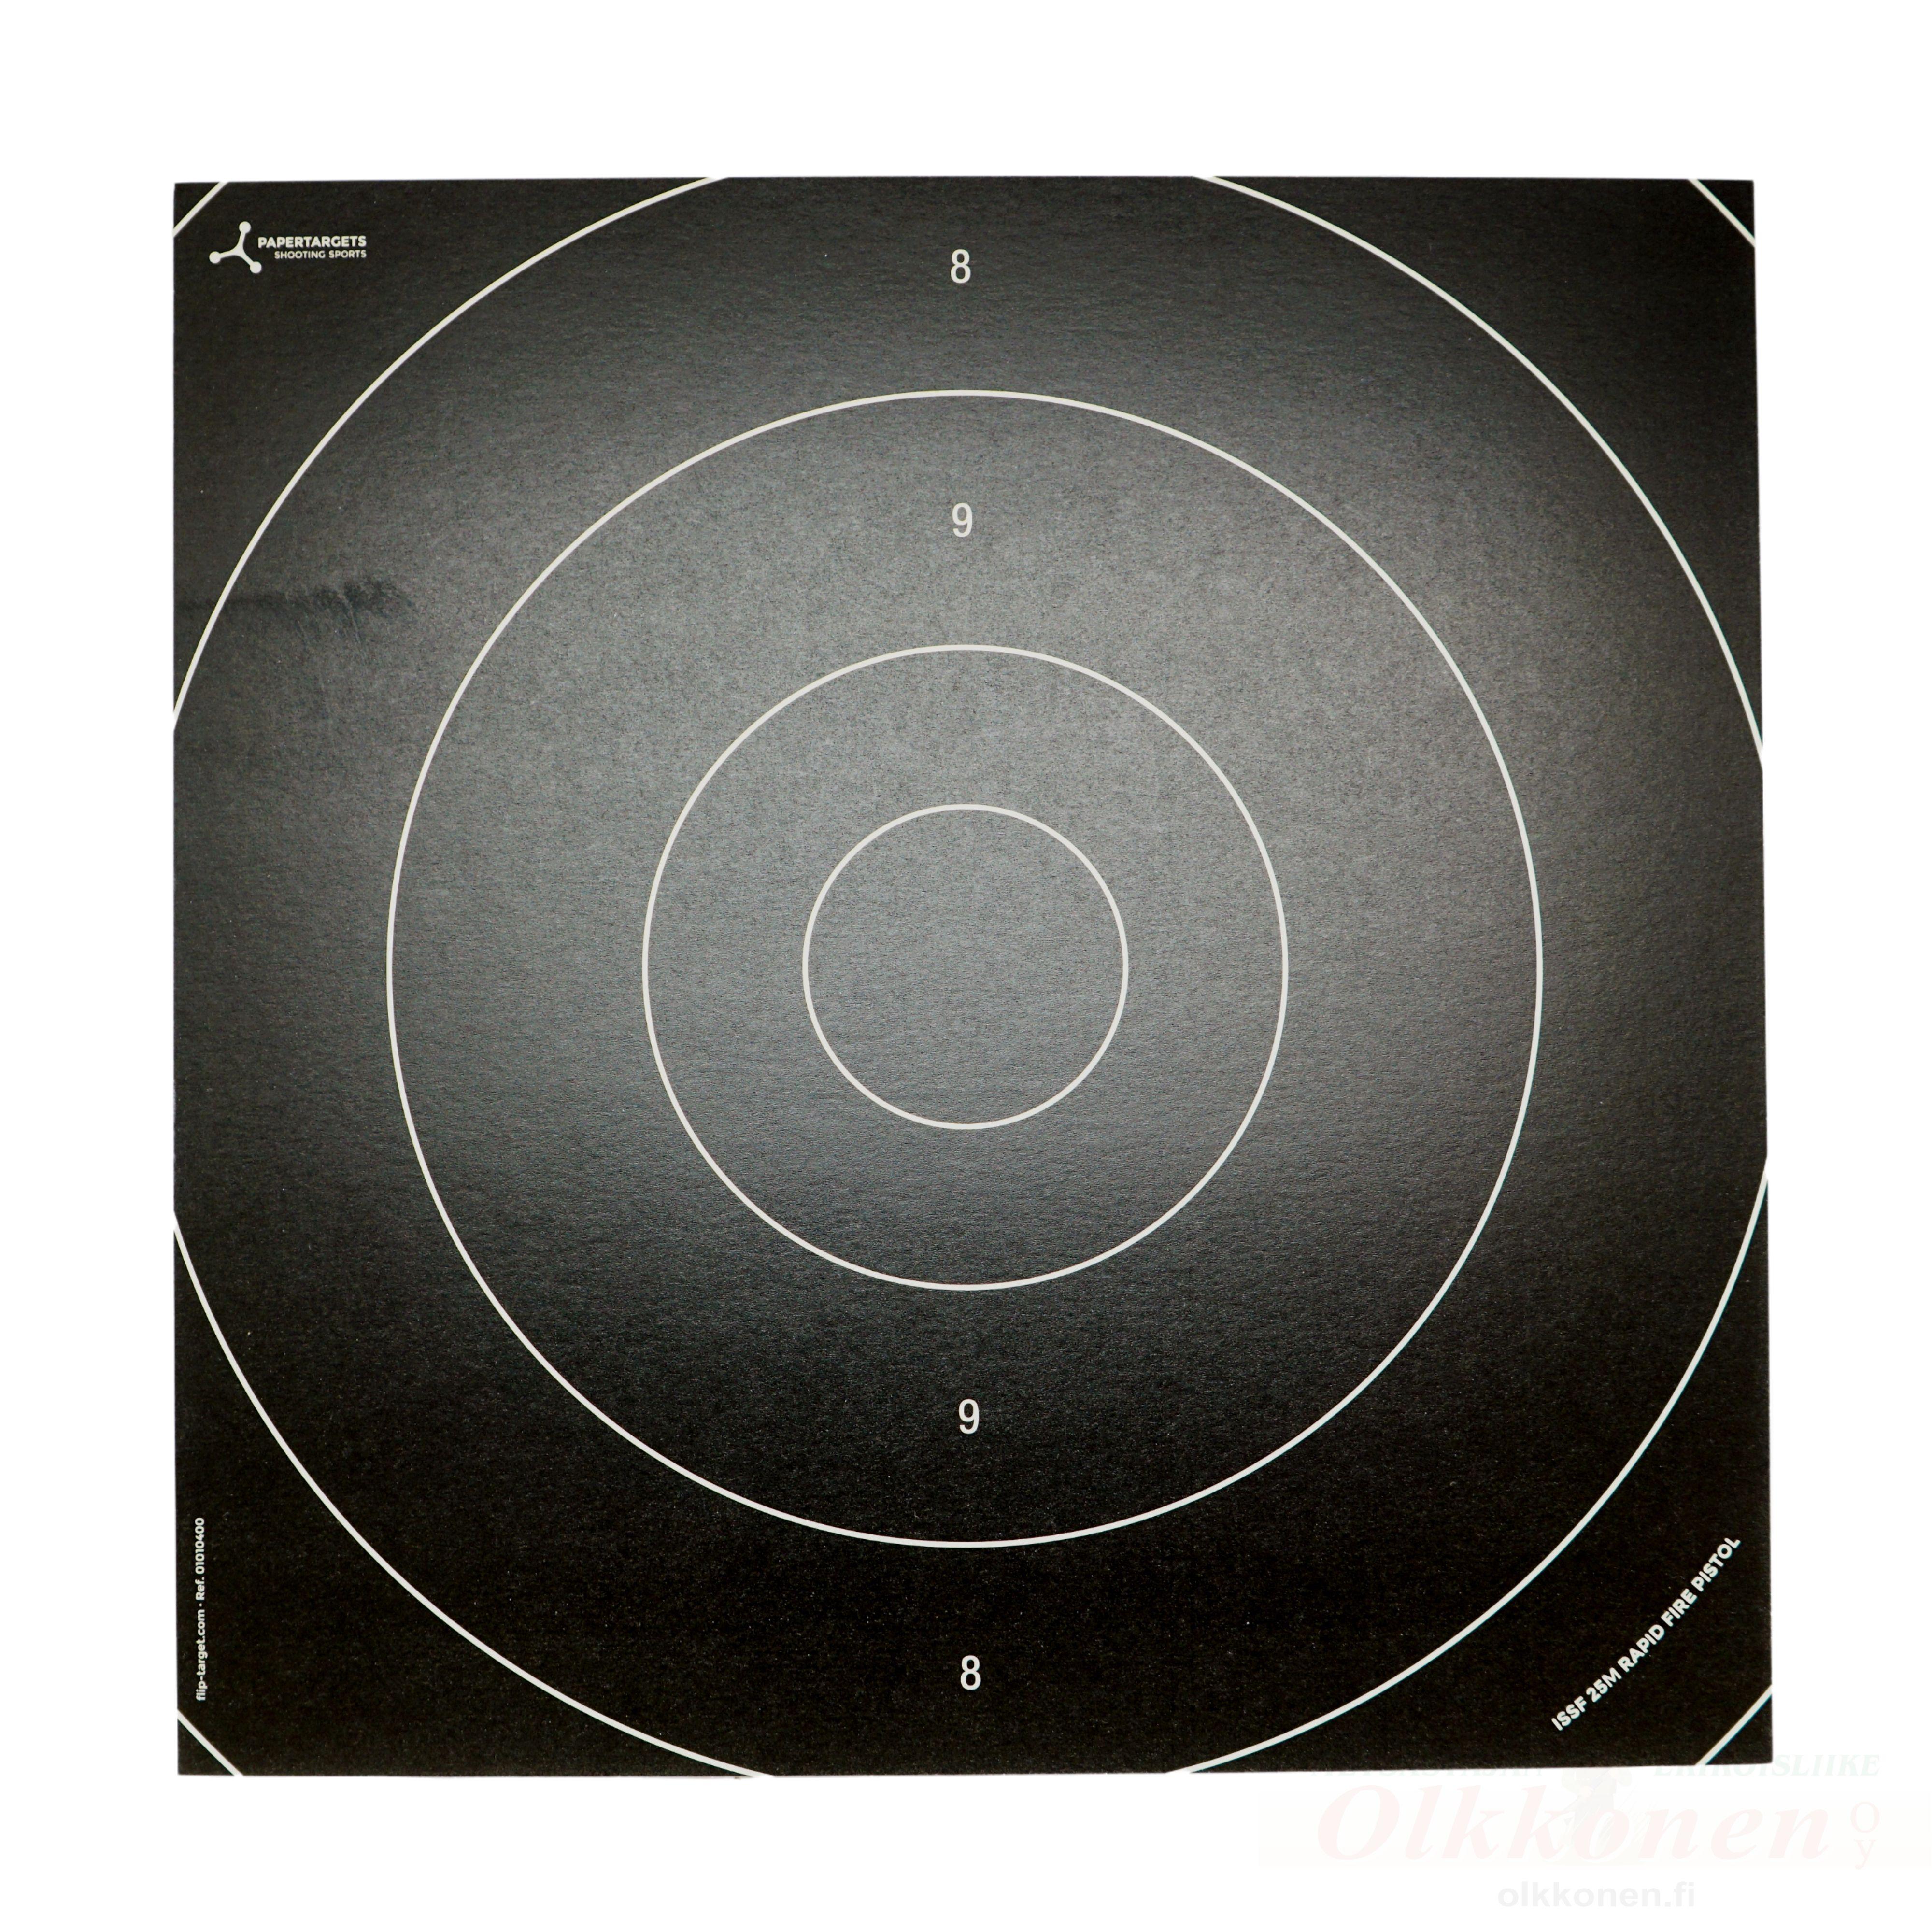 Flip target virallinen 25m 25x25 cm koulutaulu 100kpl